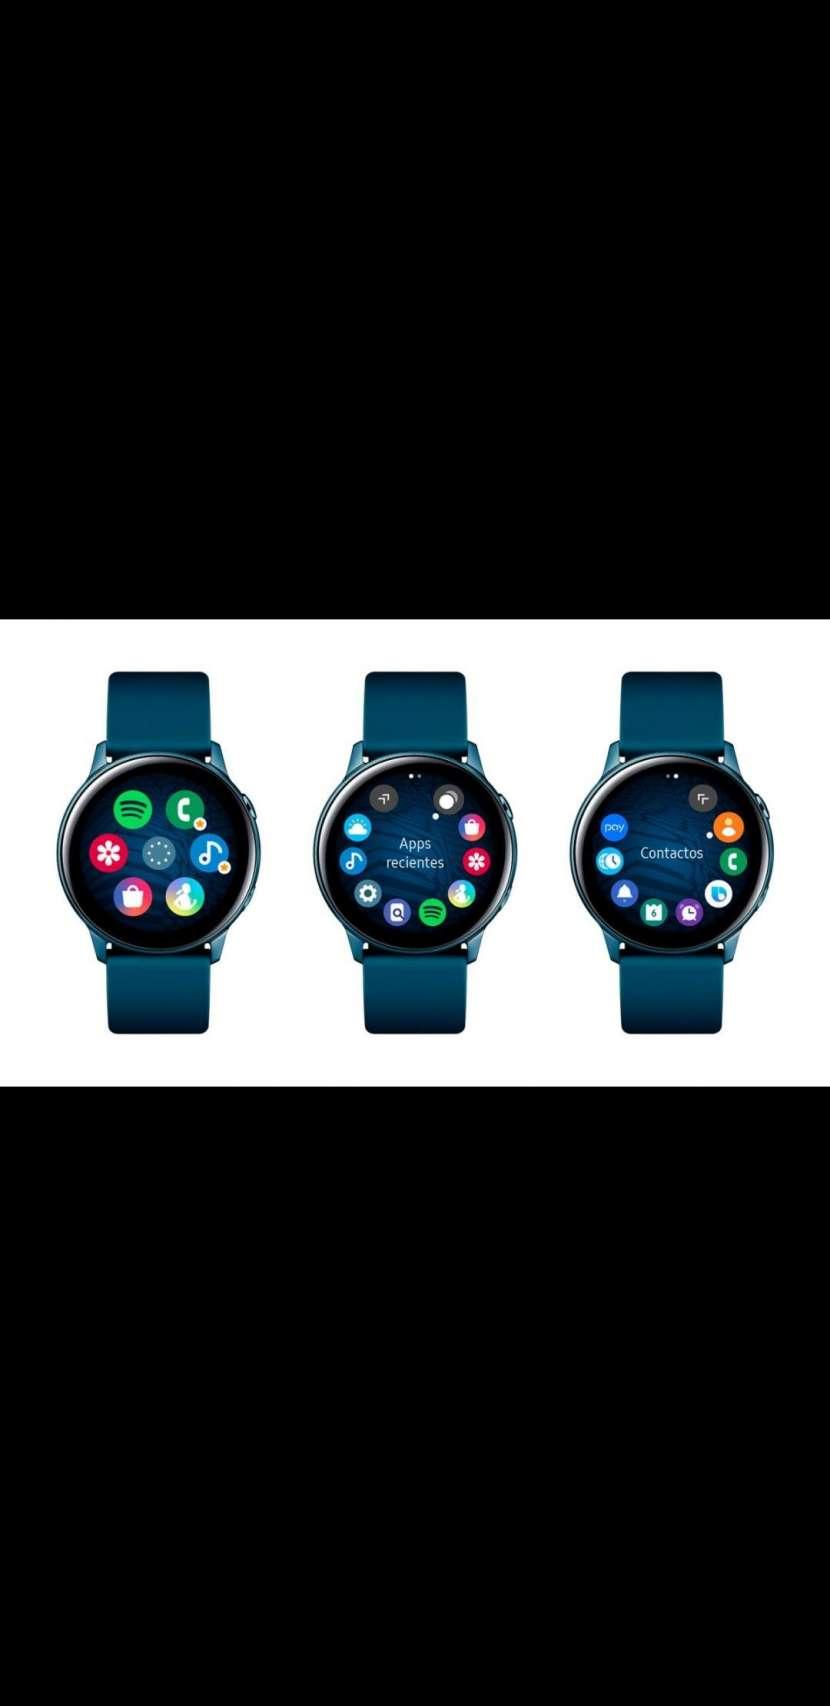 Smartwatch - 3